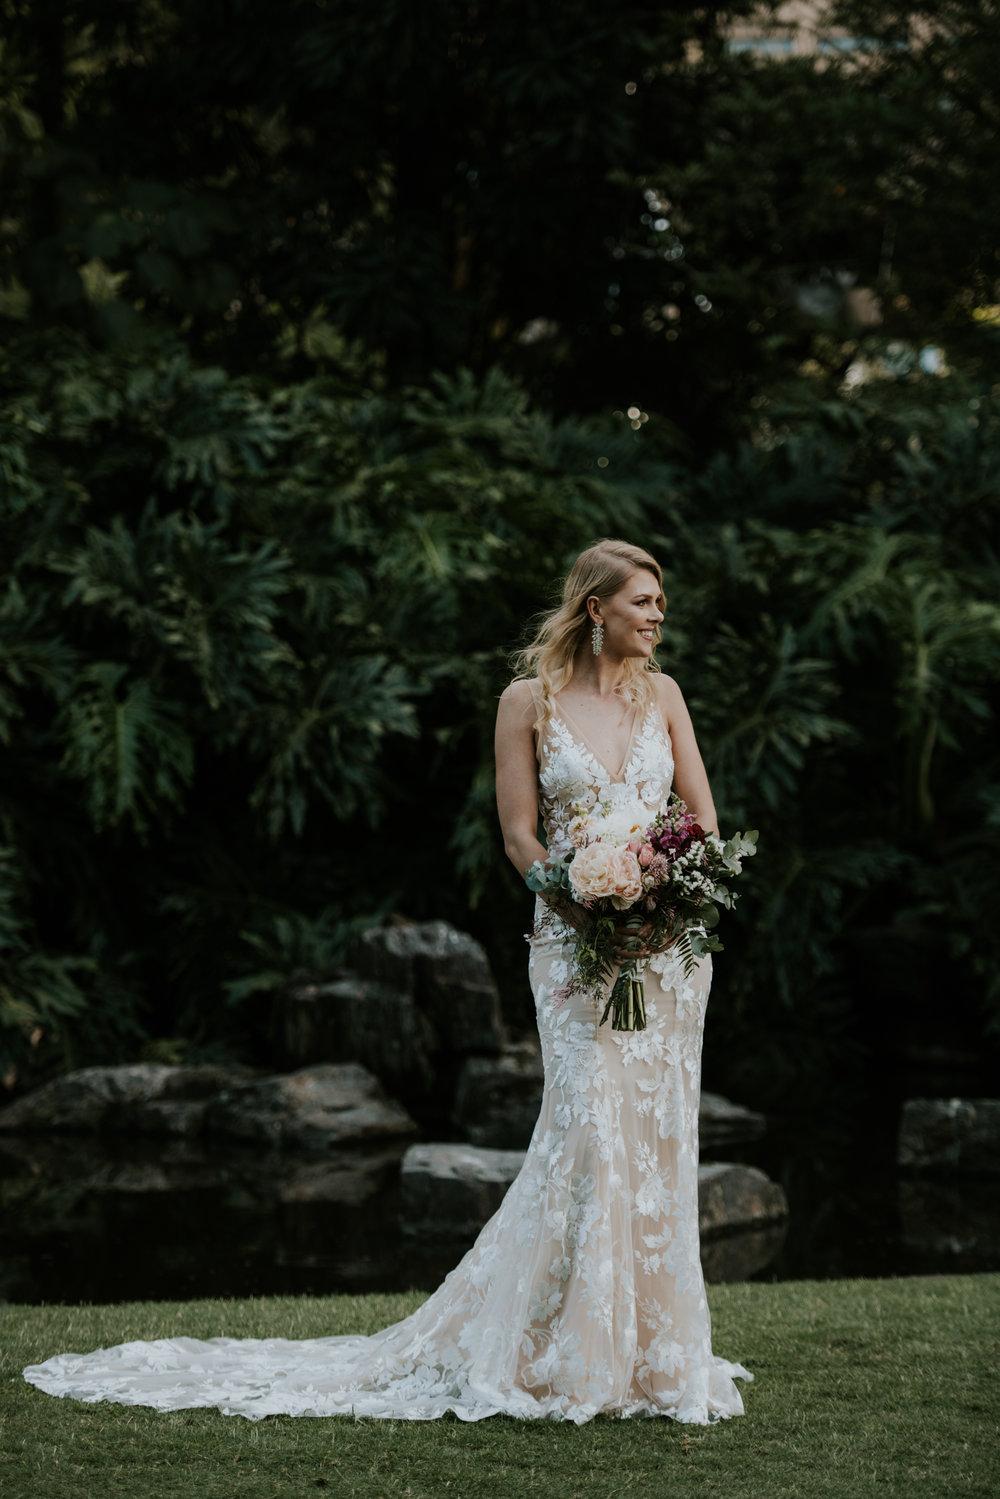 Brisbane Wedding Photographer | Engagement-Elopement Photography | Factory51-City Botantic Gardens Wedding-43.jpg